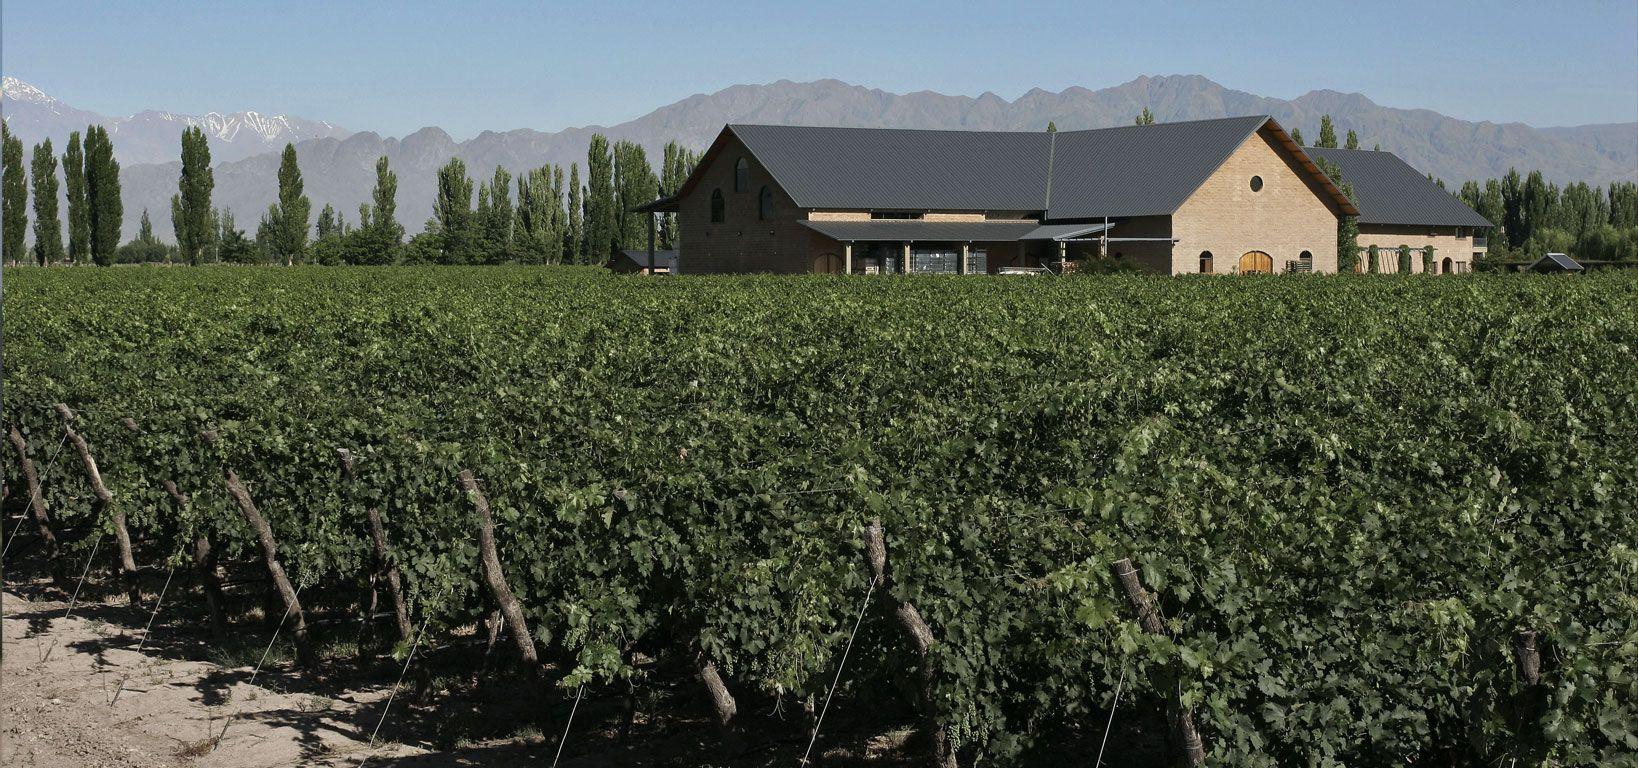 Dominio Del Plata Winery Bodegas Vinos Argentinos Argentina